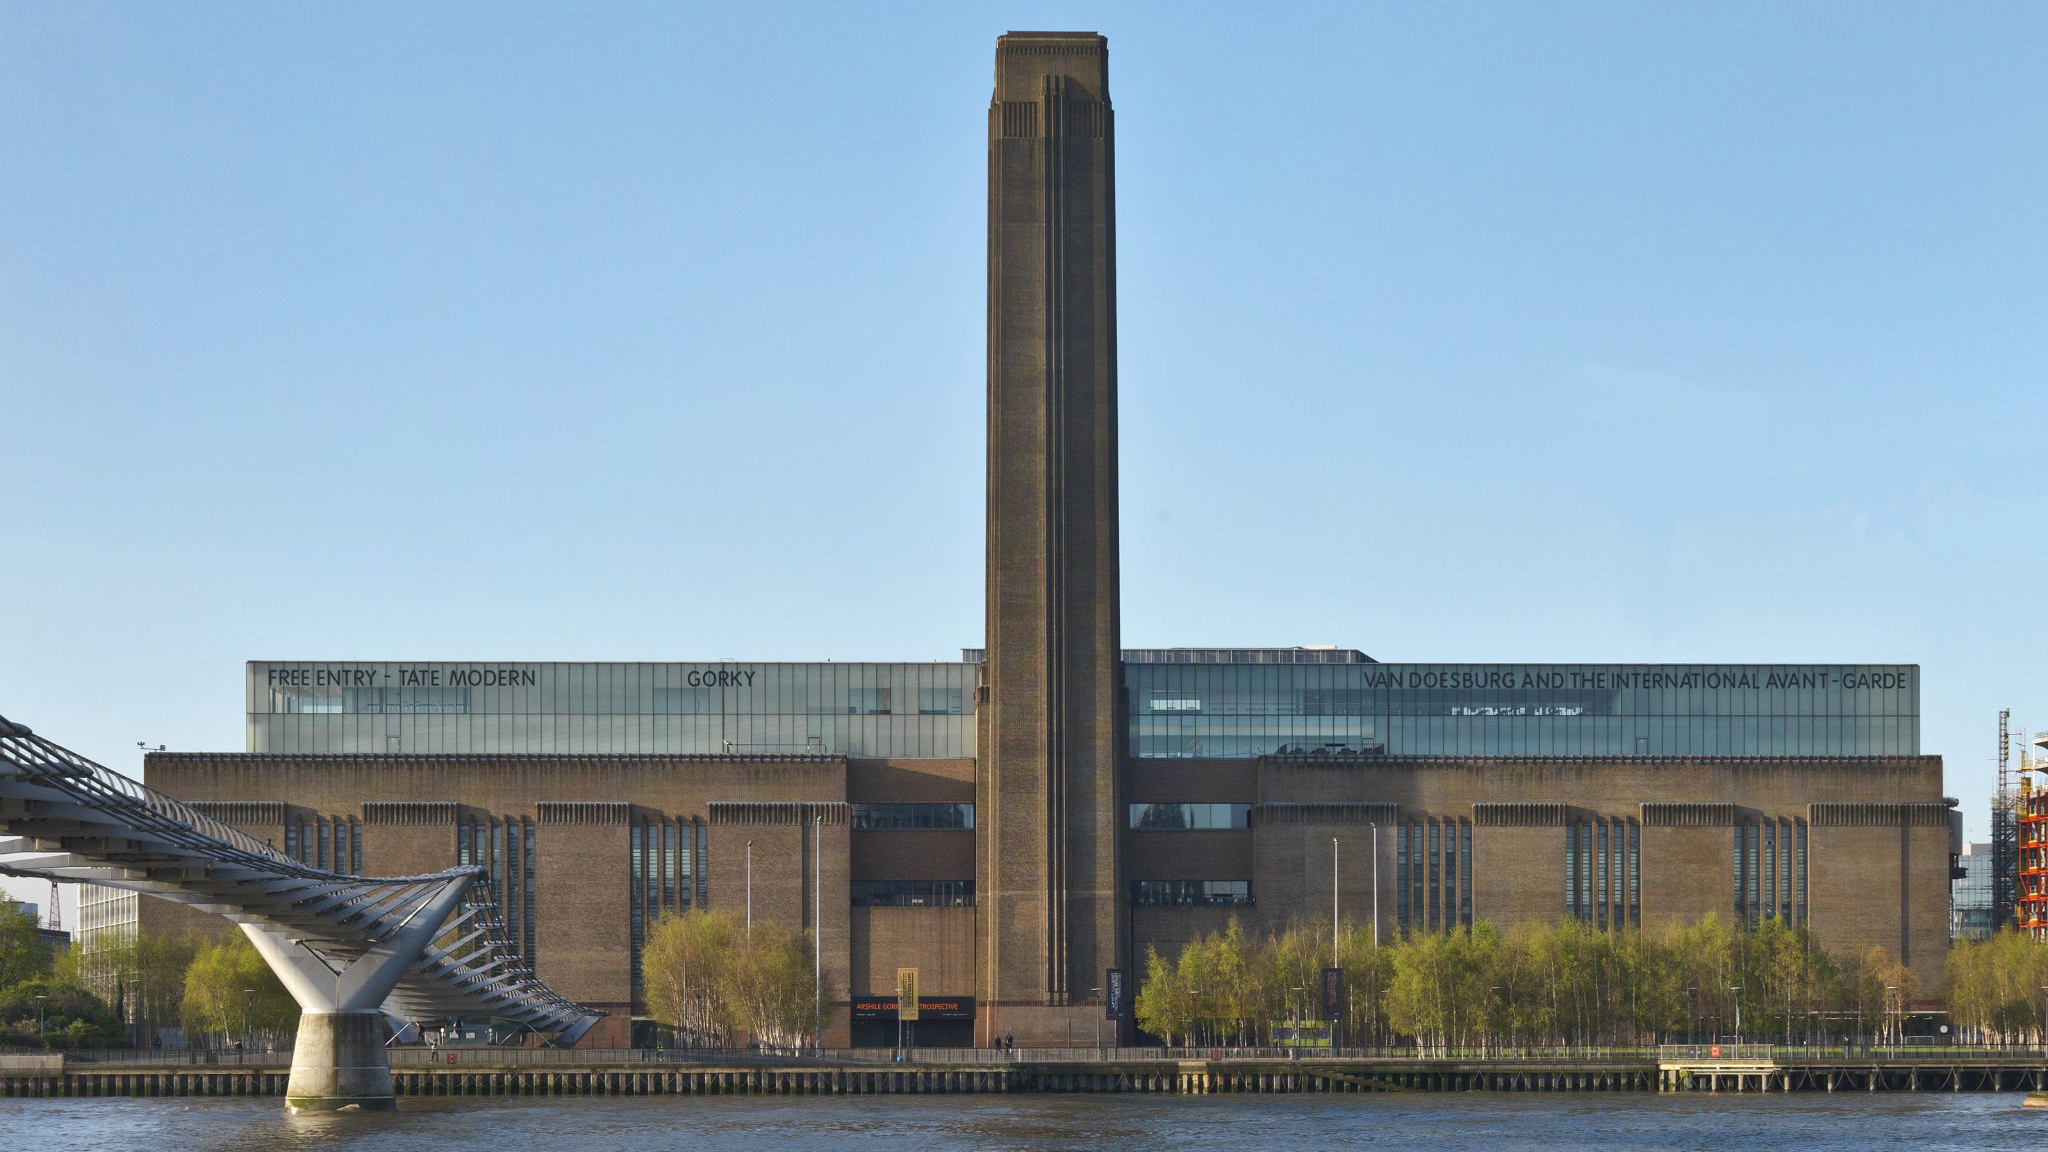 La Tate Modern, a Londra